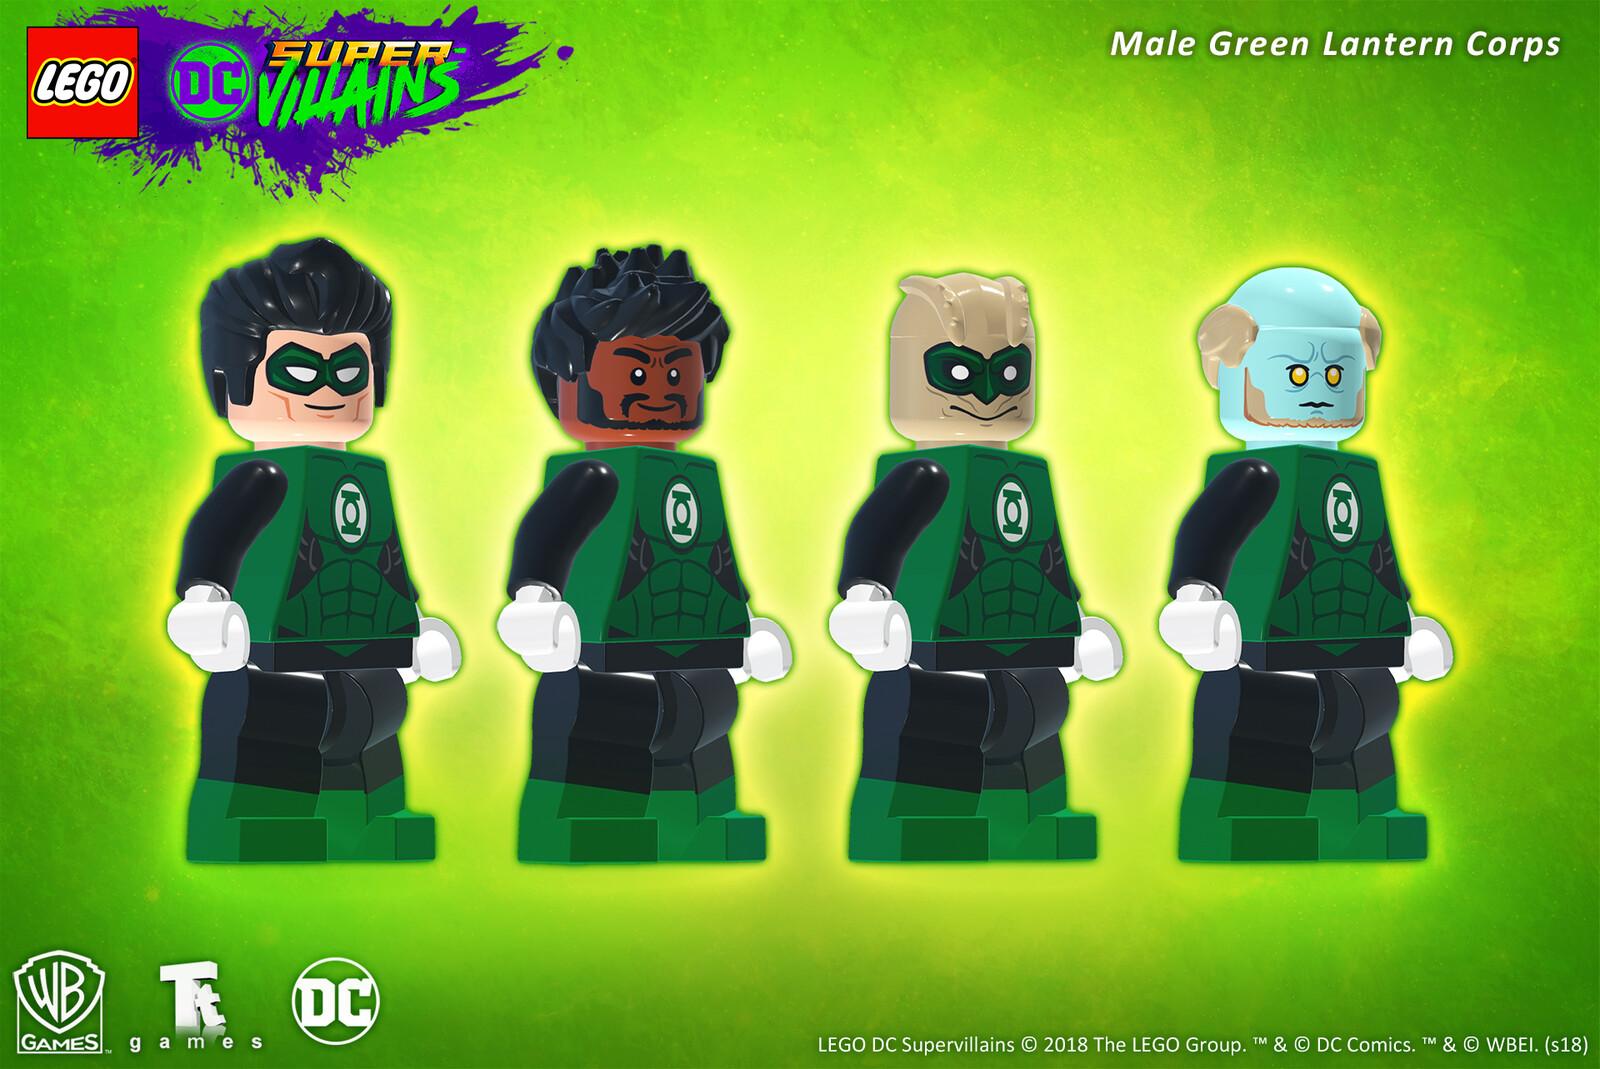 Male Green Lantern Corps